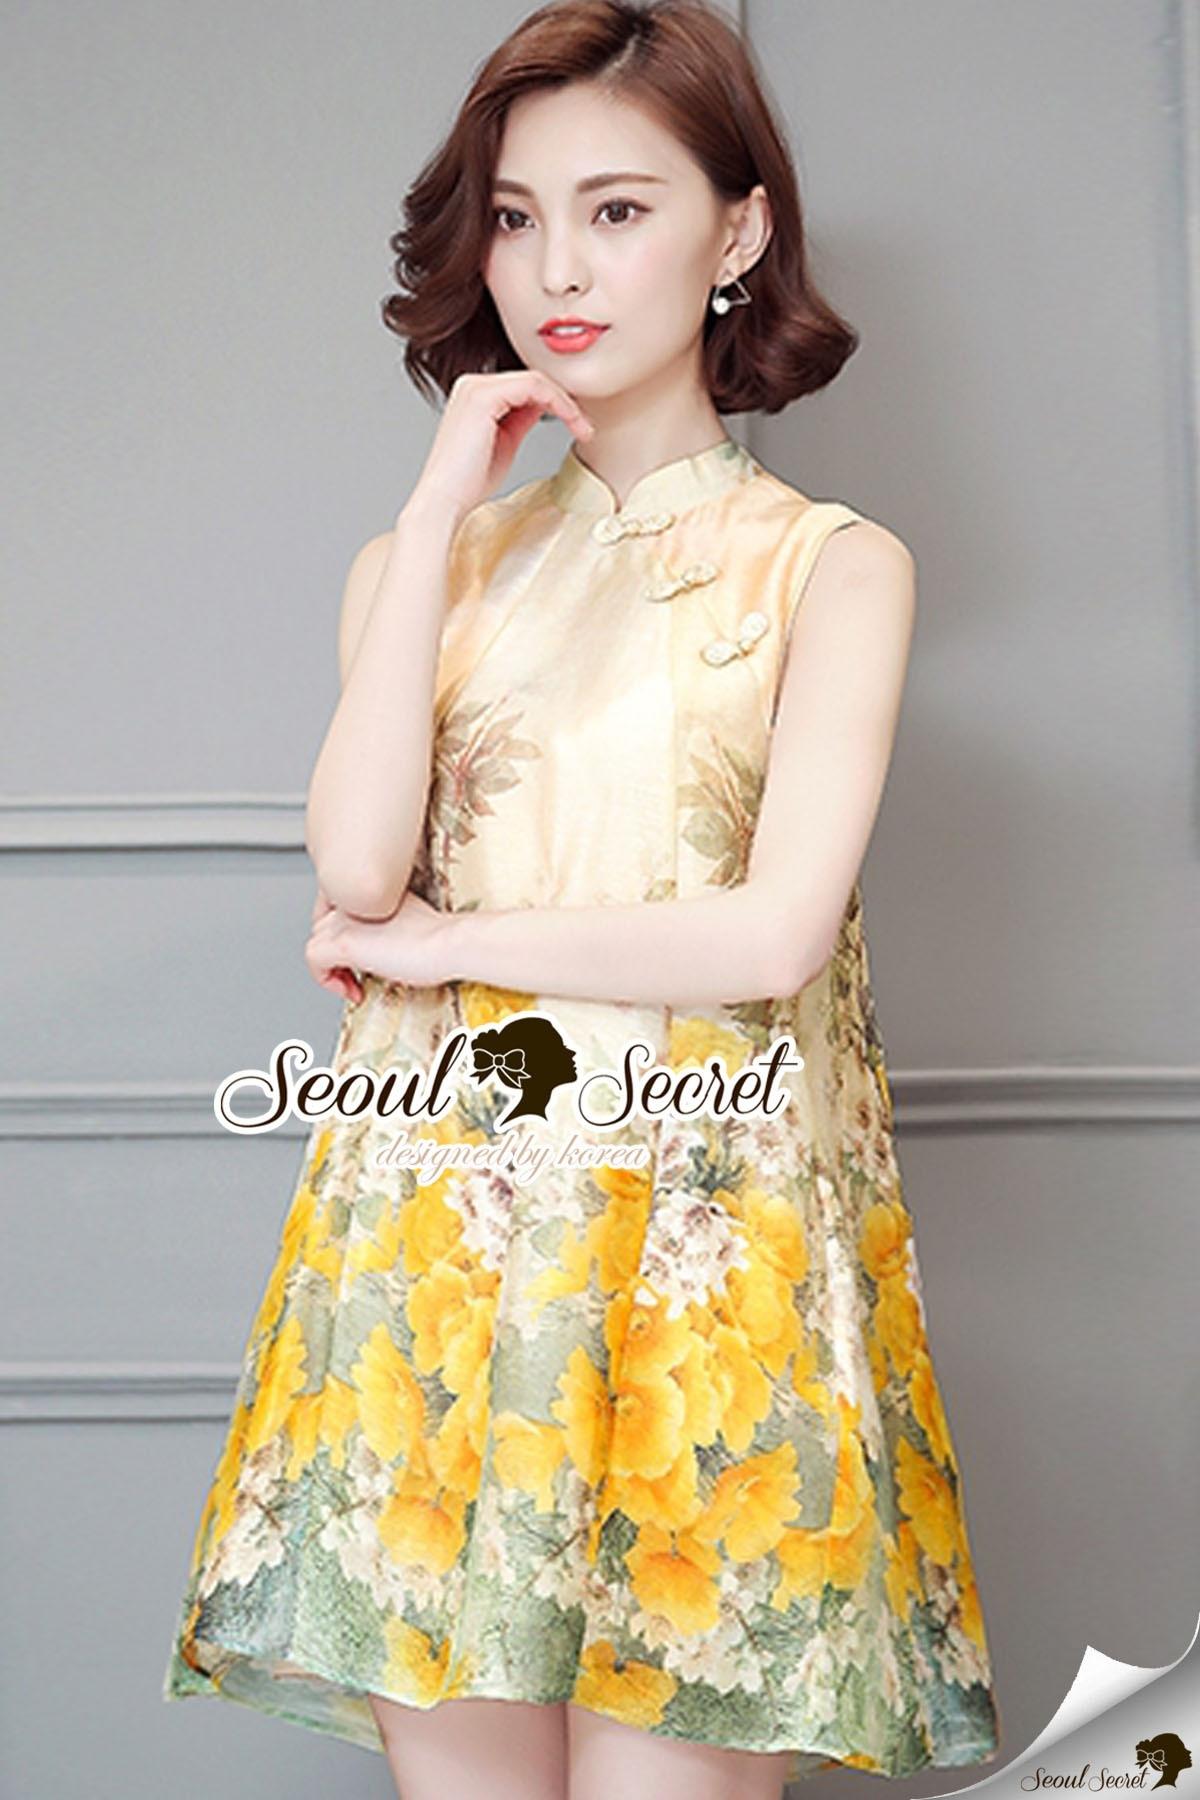 Seoul Secret Say's... Yellow Flora Girly Silkly Dress